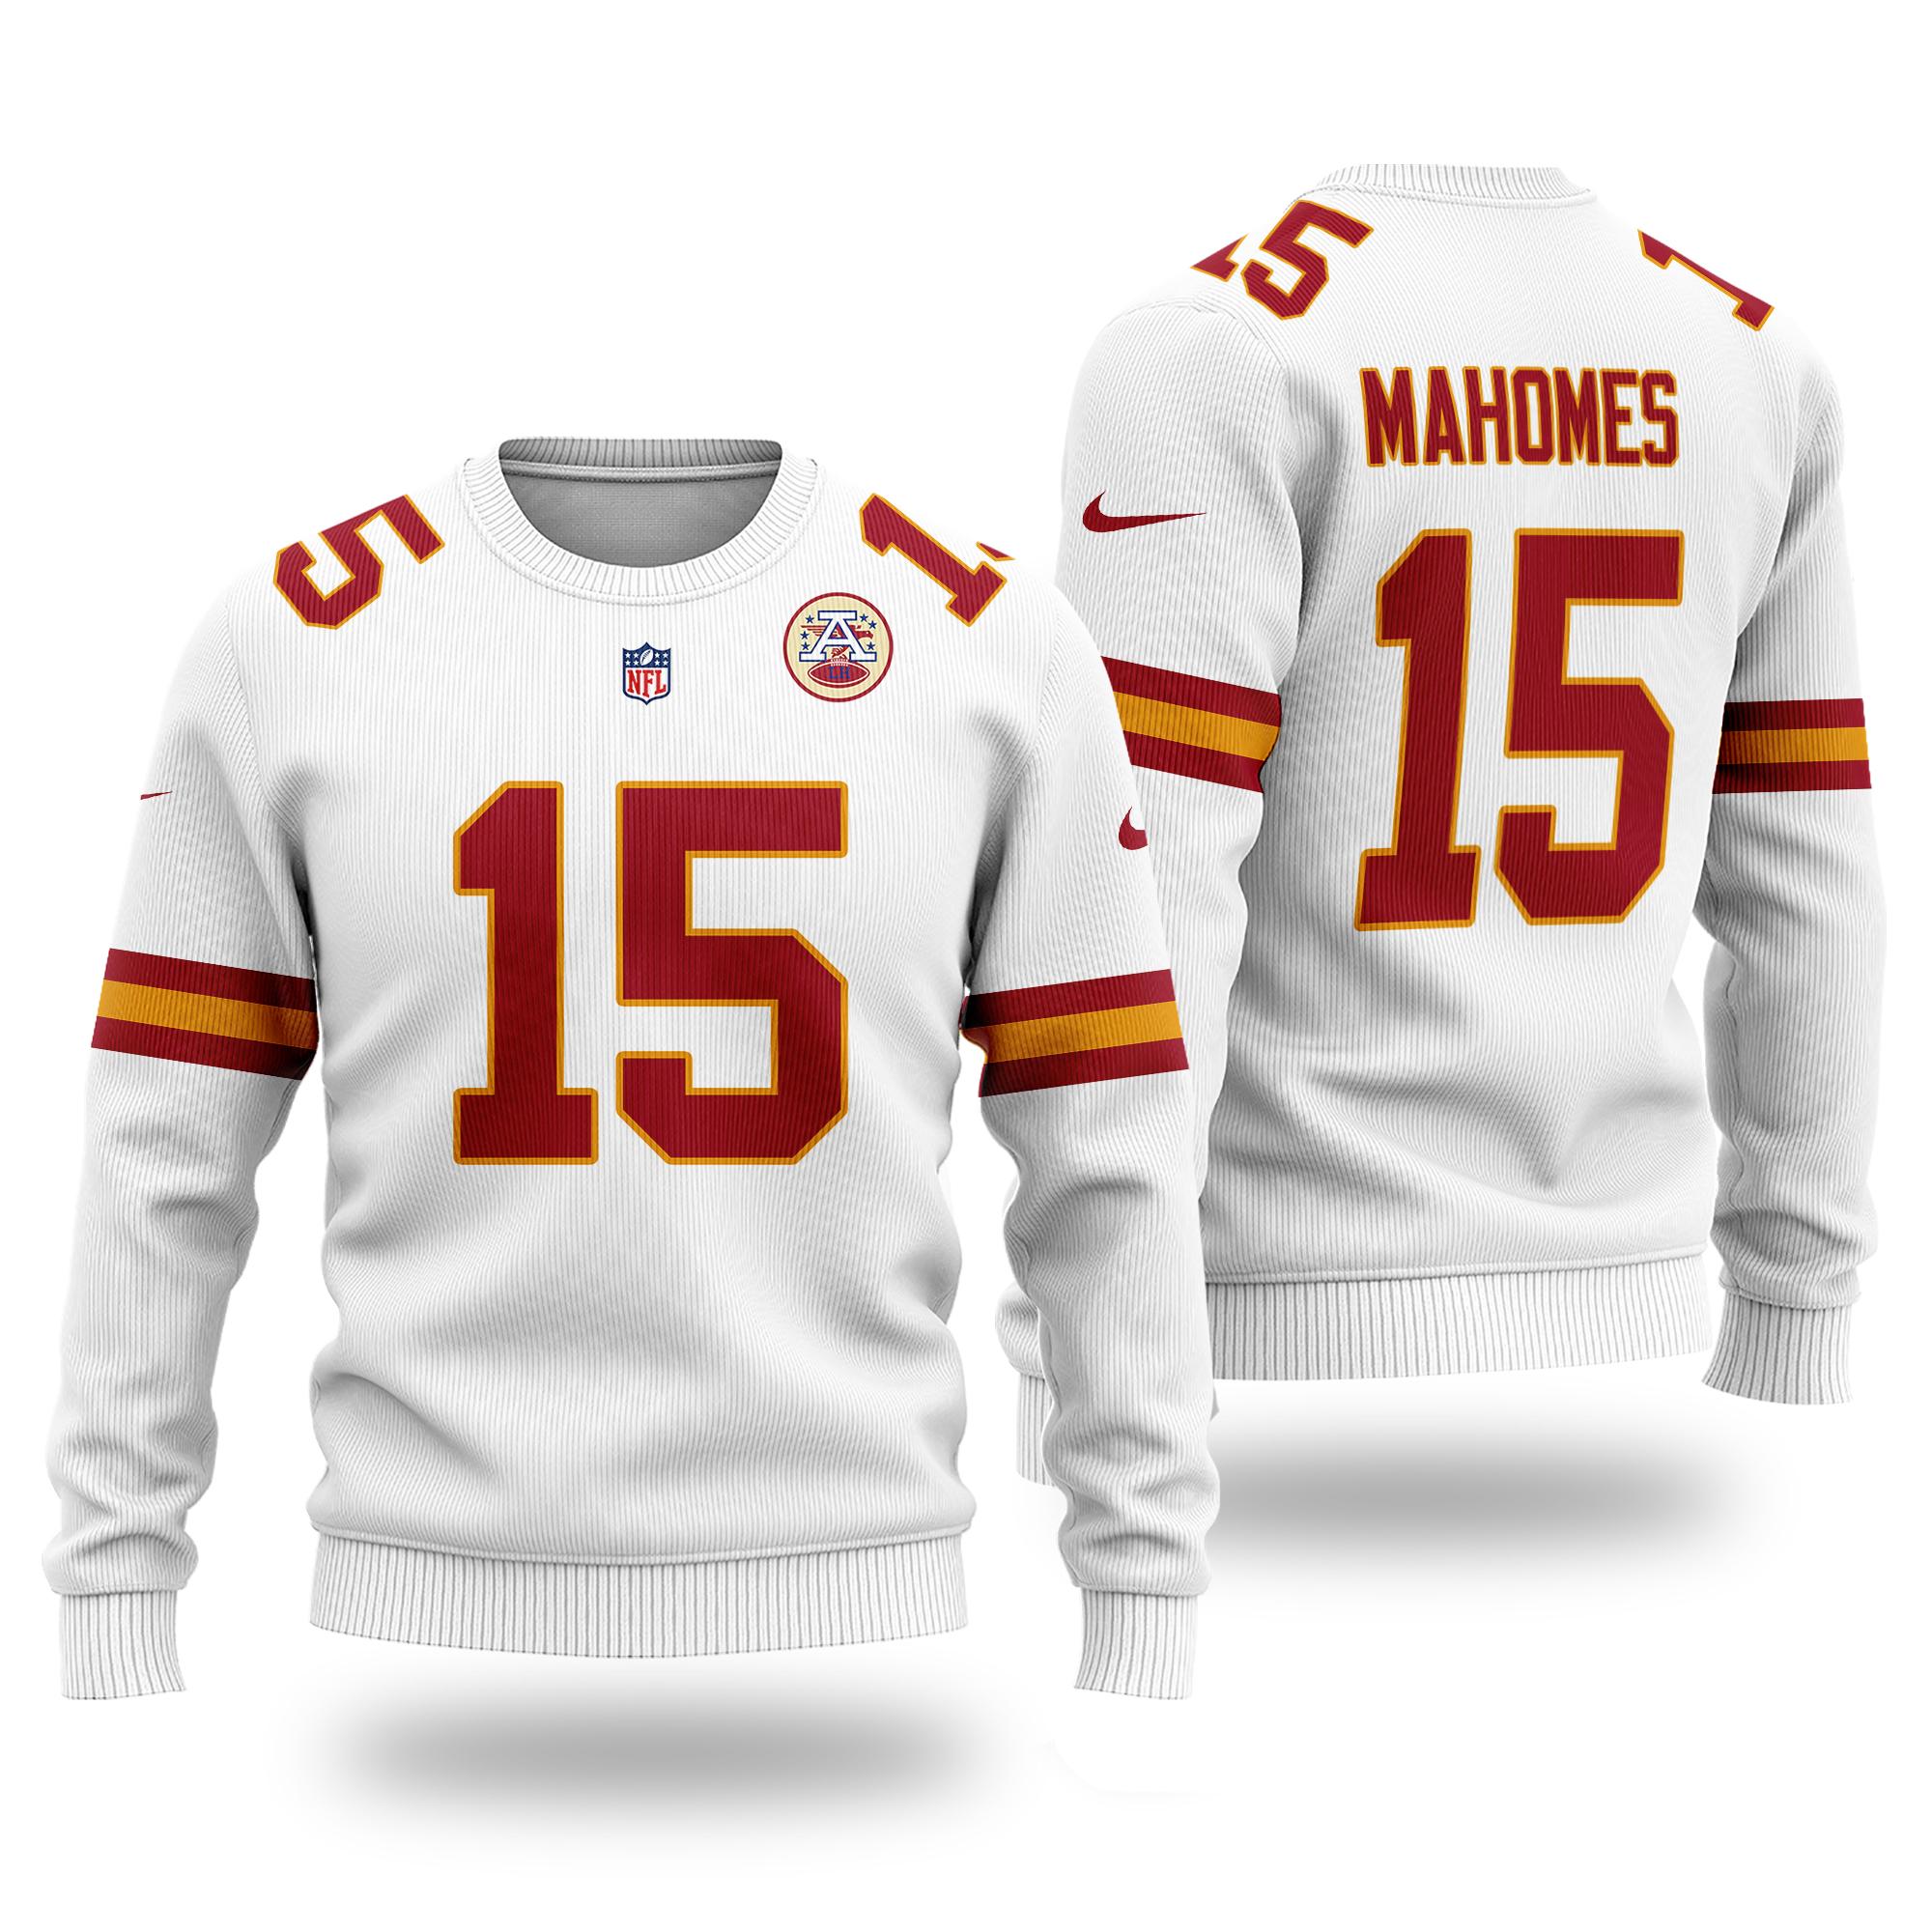 NFL KANSAS CITY CHIEFS Patrick Mahomes 15 white original Sweater